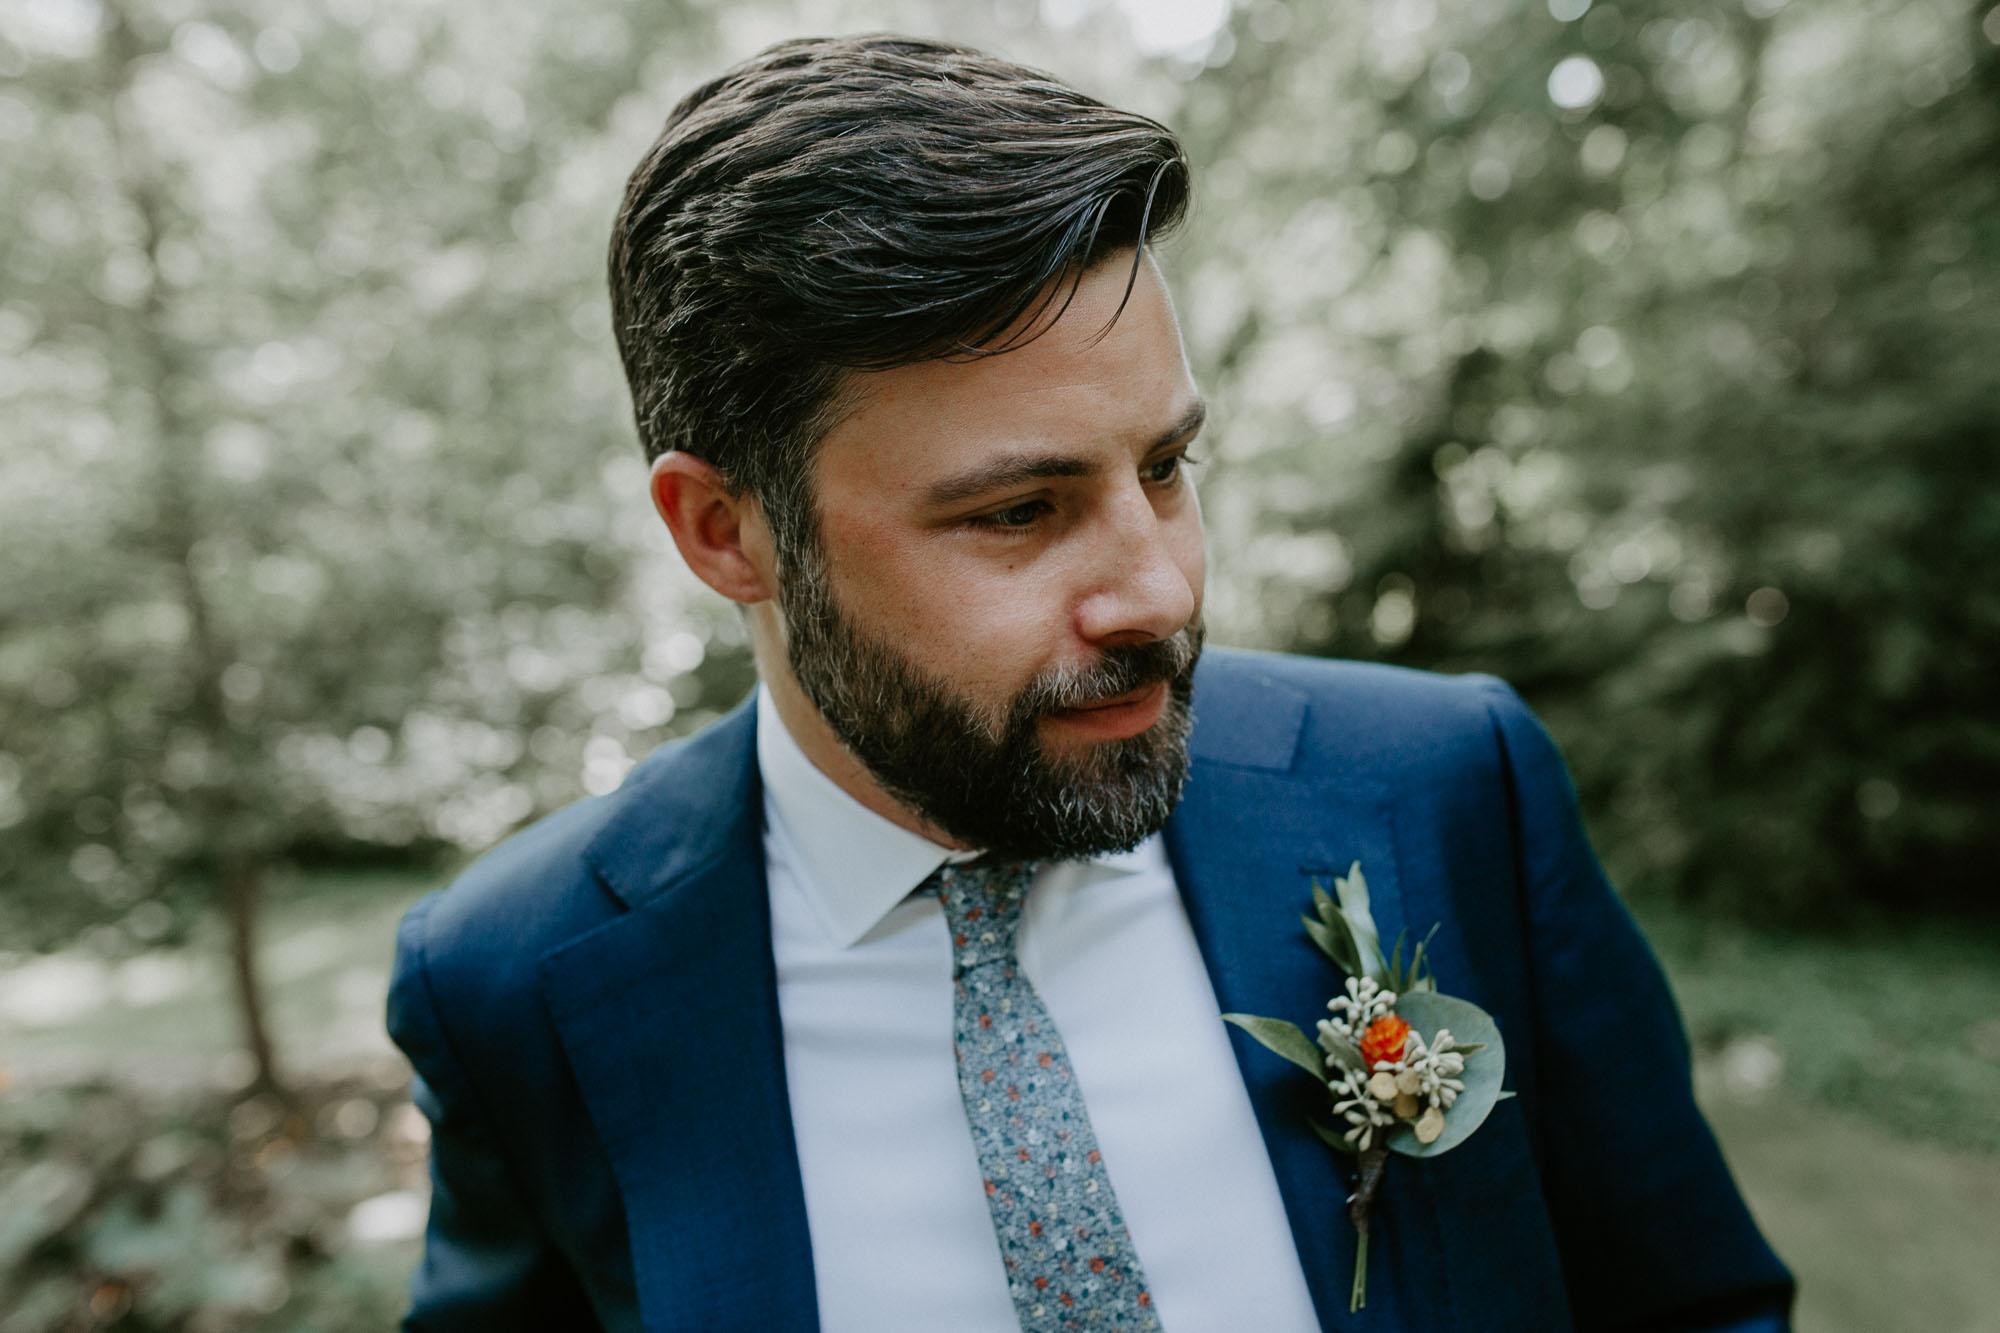 journeyman_distillery_wedding_photographer_chicago_il_wright_photographs-2249.jpg